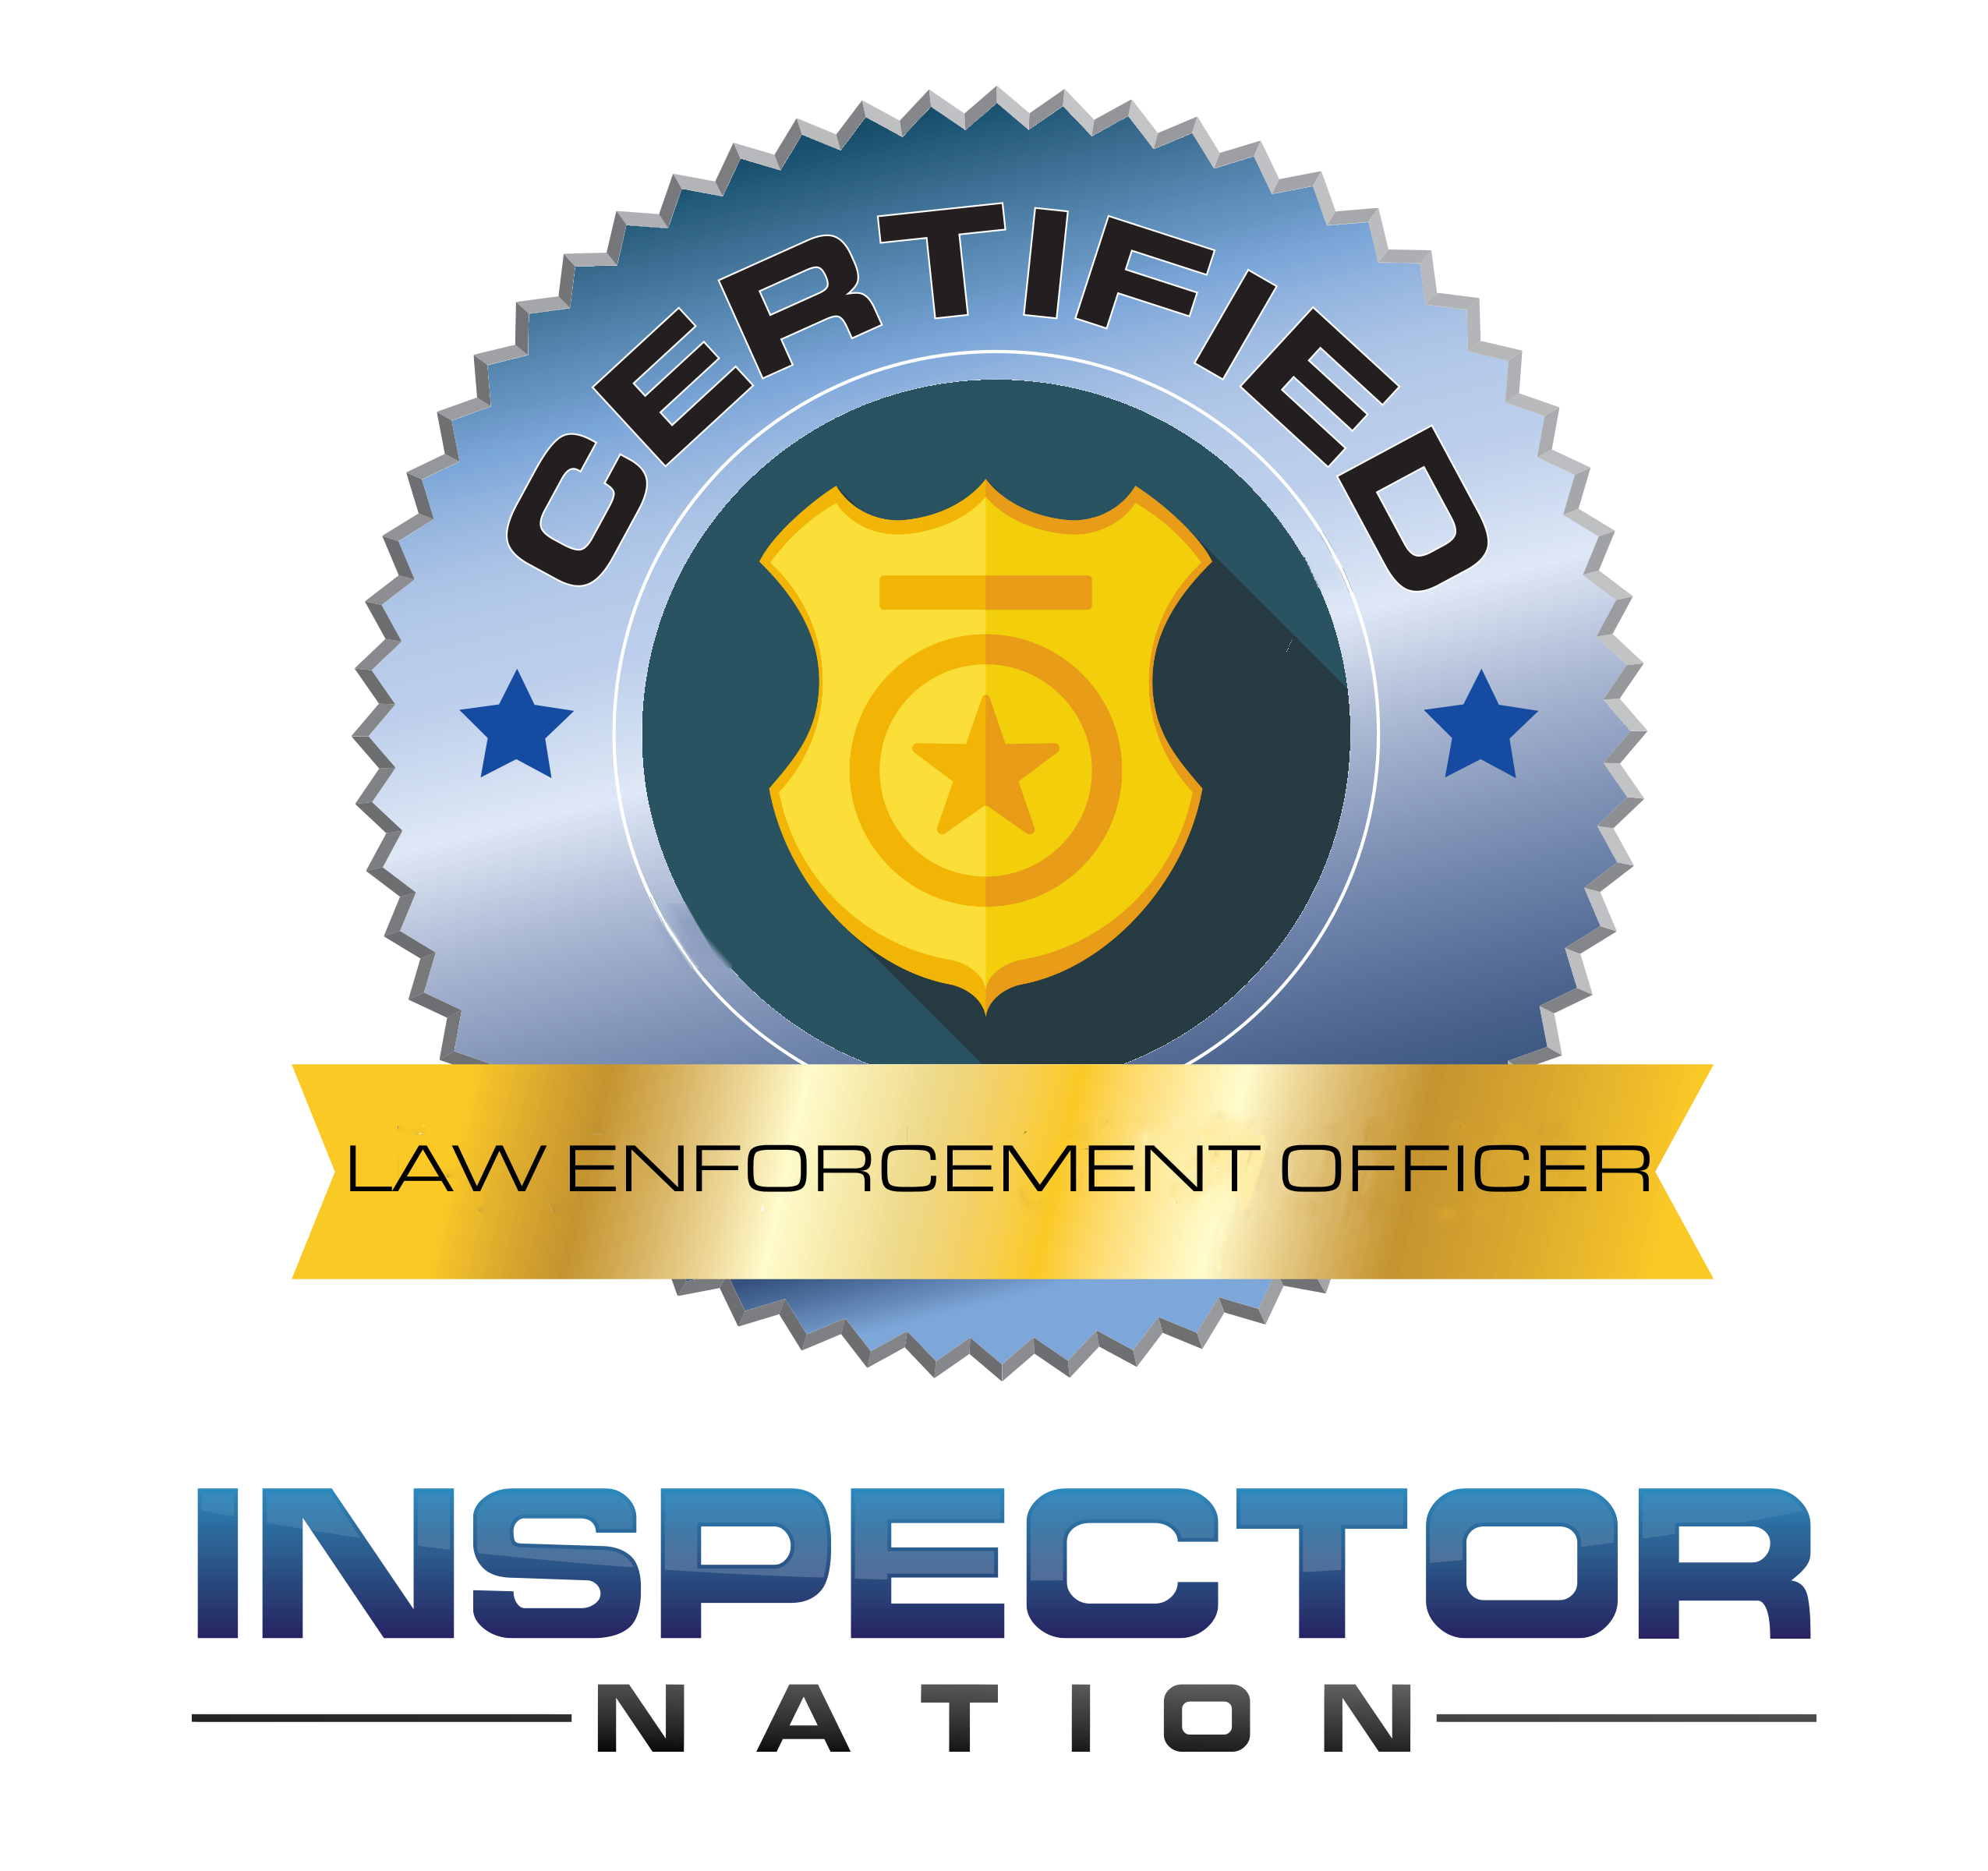 law enforcement officer  inspector nation certified home inspector badge emblem icon